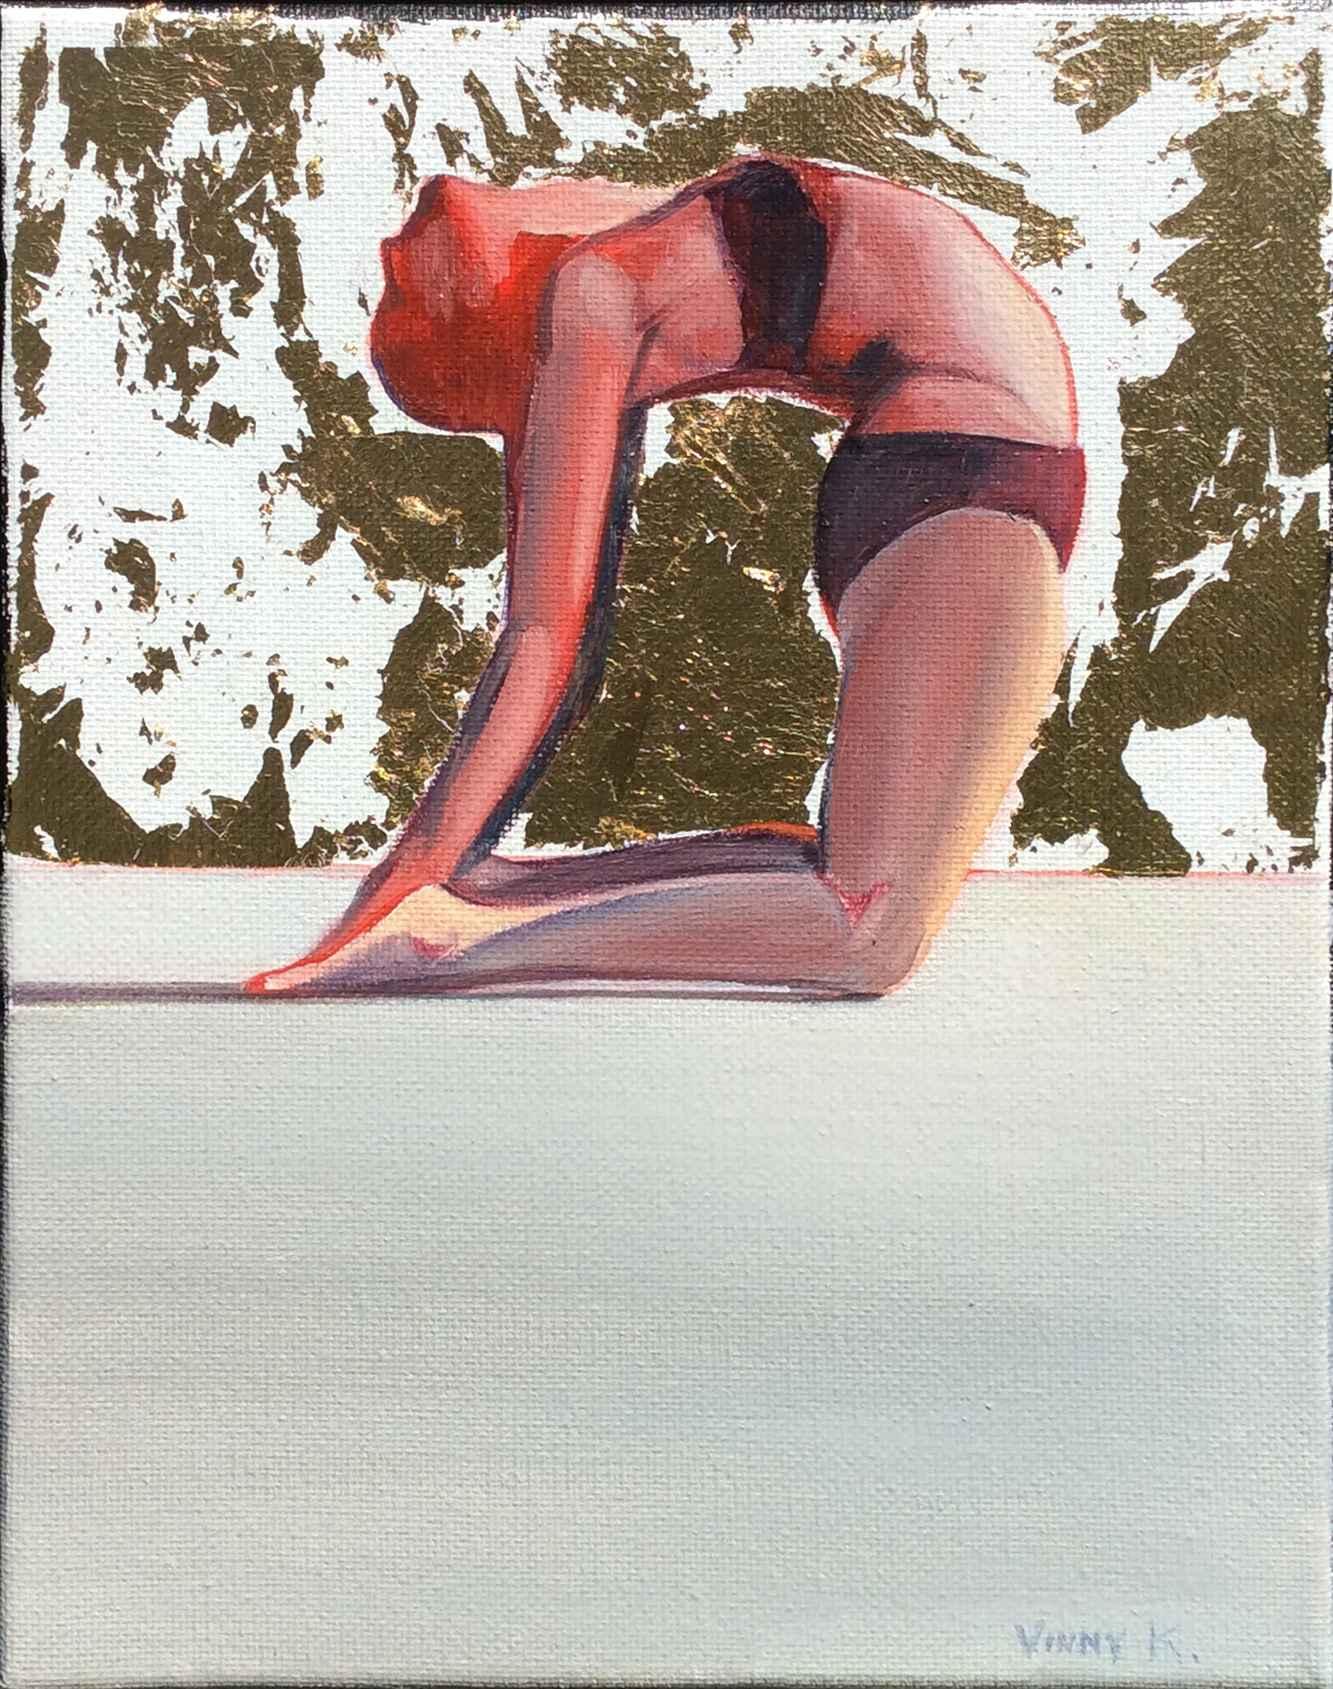 Anarasana by  Vinny K - Masterpiece Online